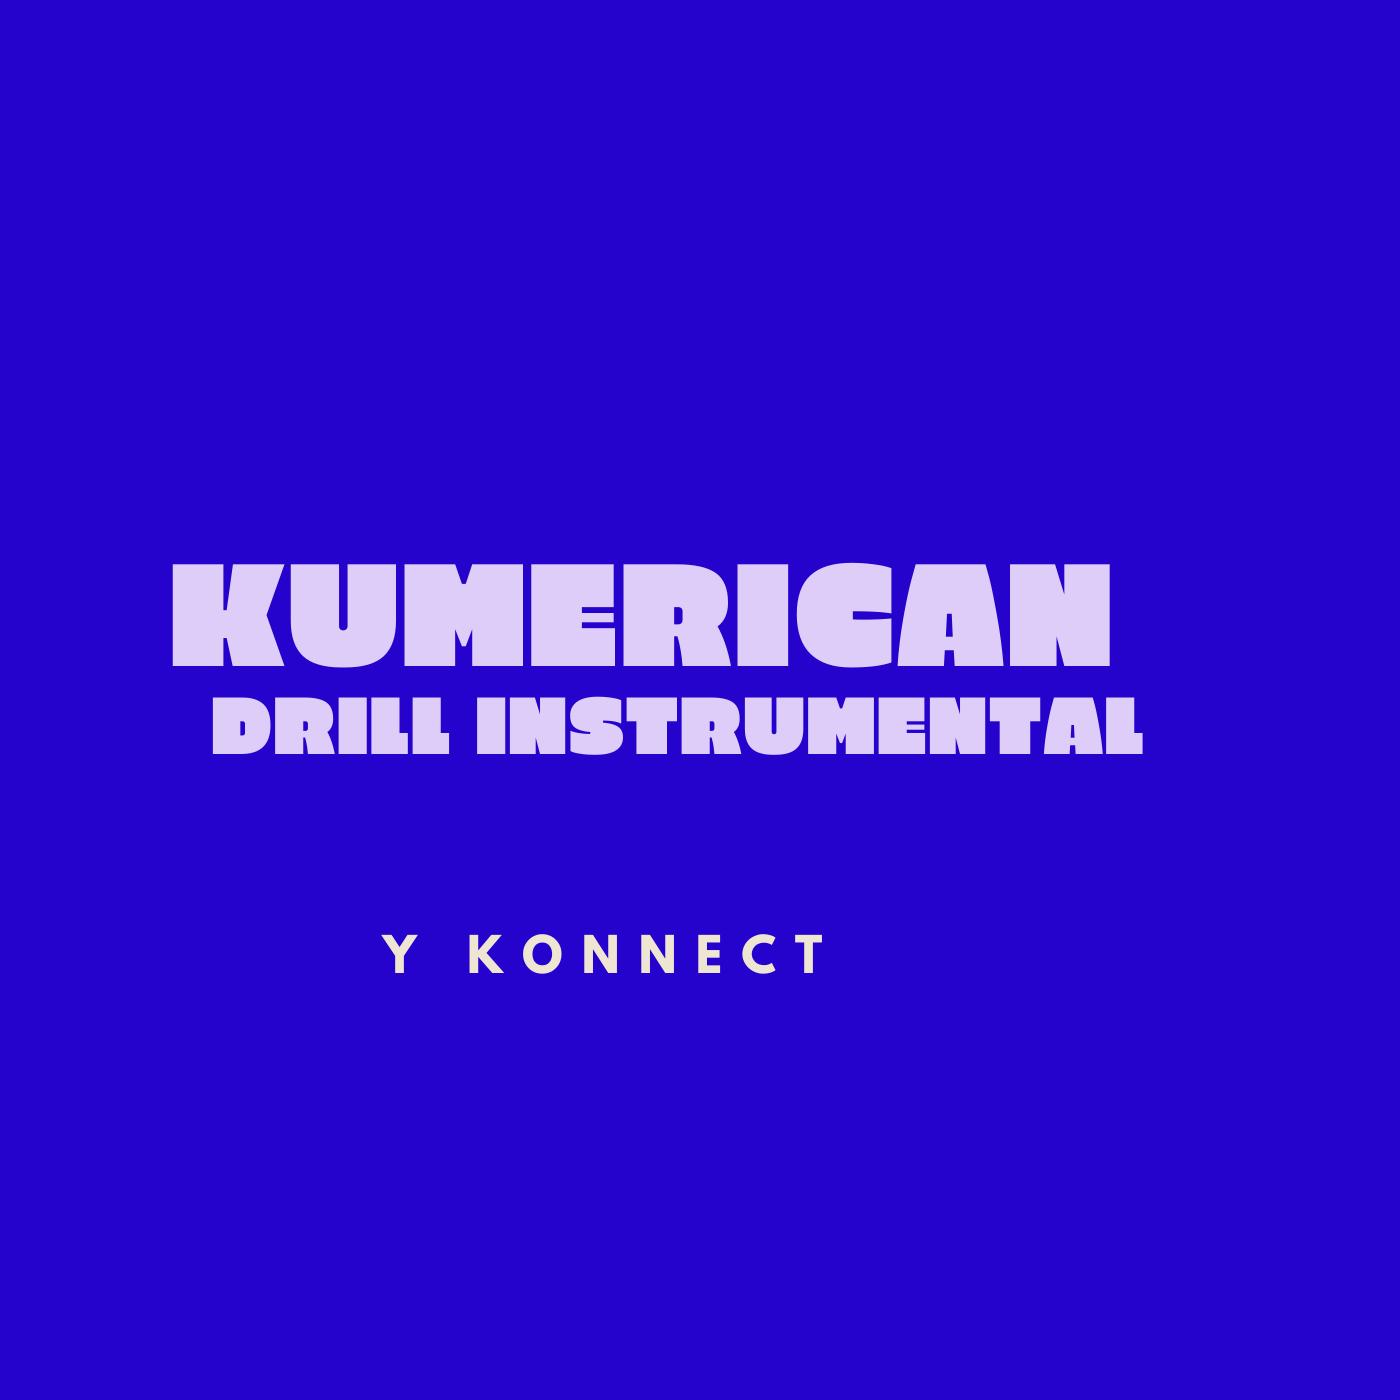 Kumerican Drill Instrumental Mp3 Download | Y Koonect